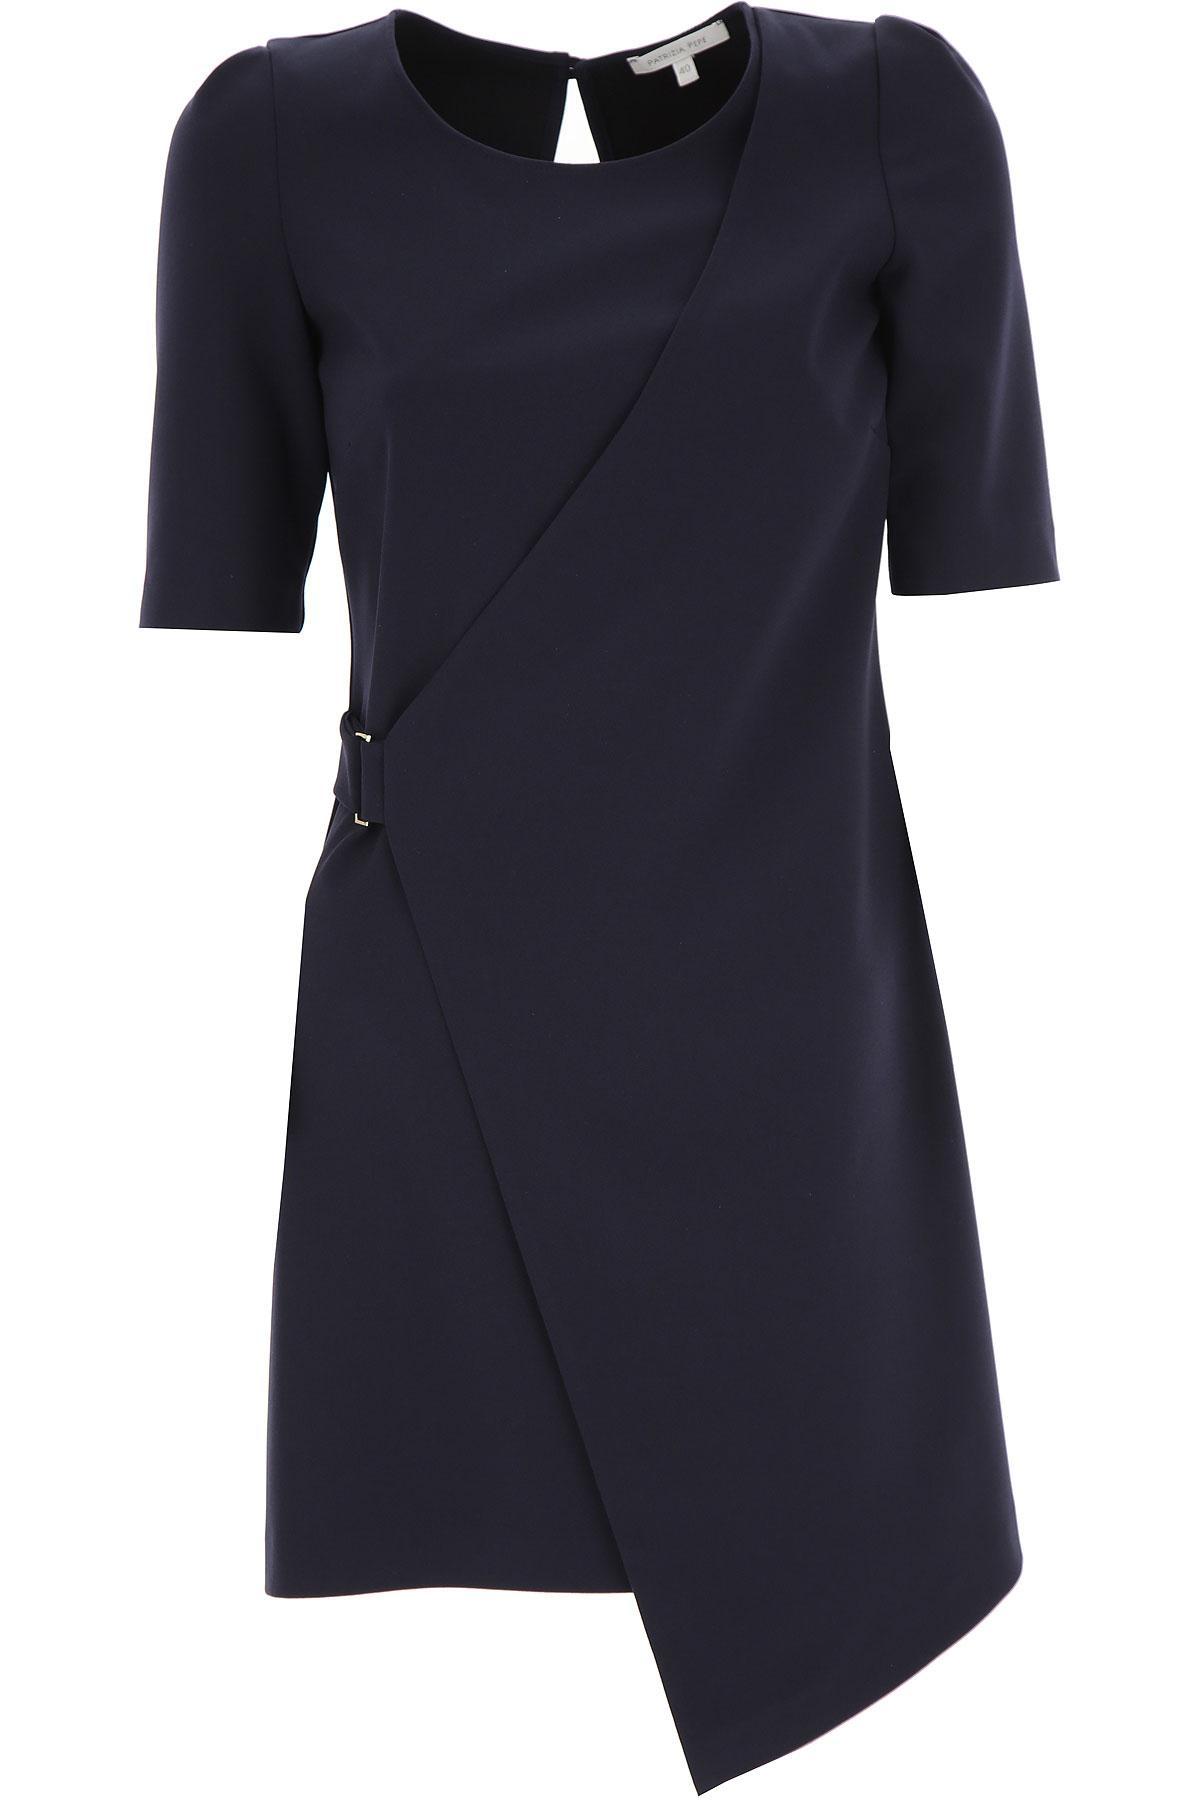 94b84da257b Lyst - Patrizia Pepe Clothing For Women in Blue